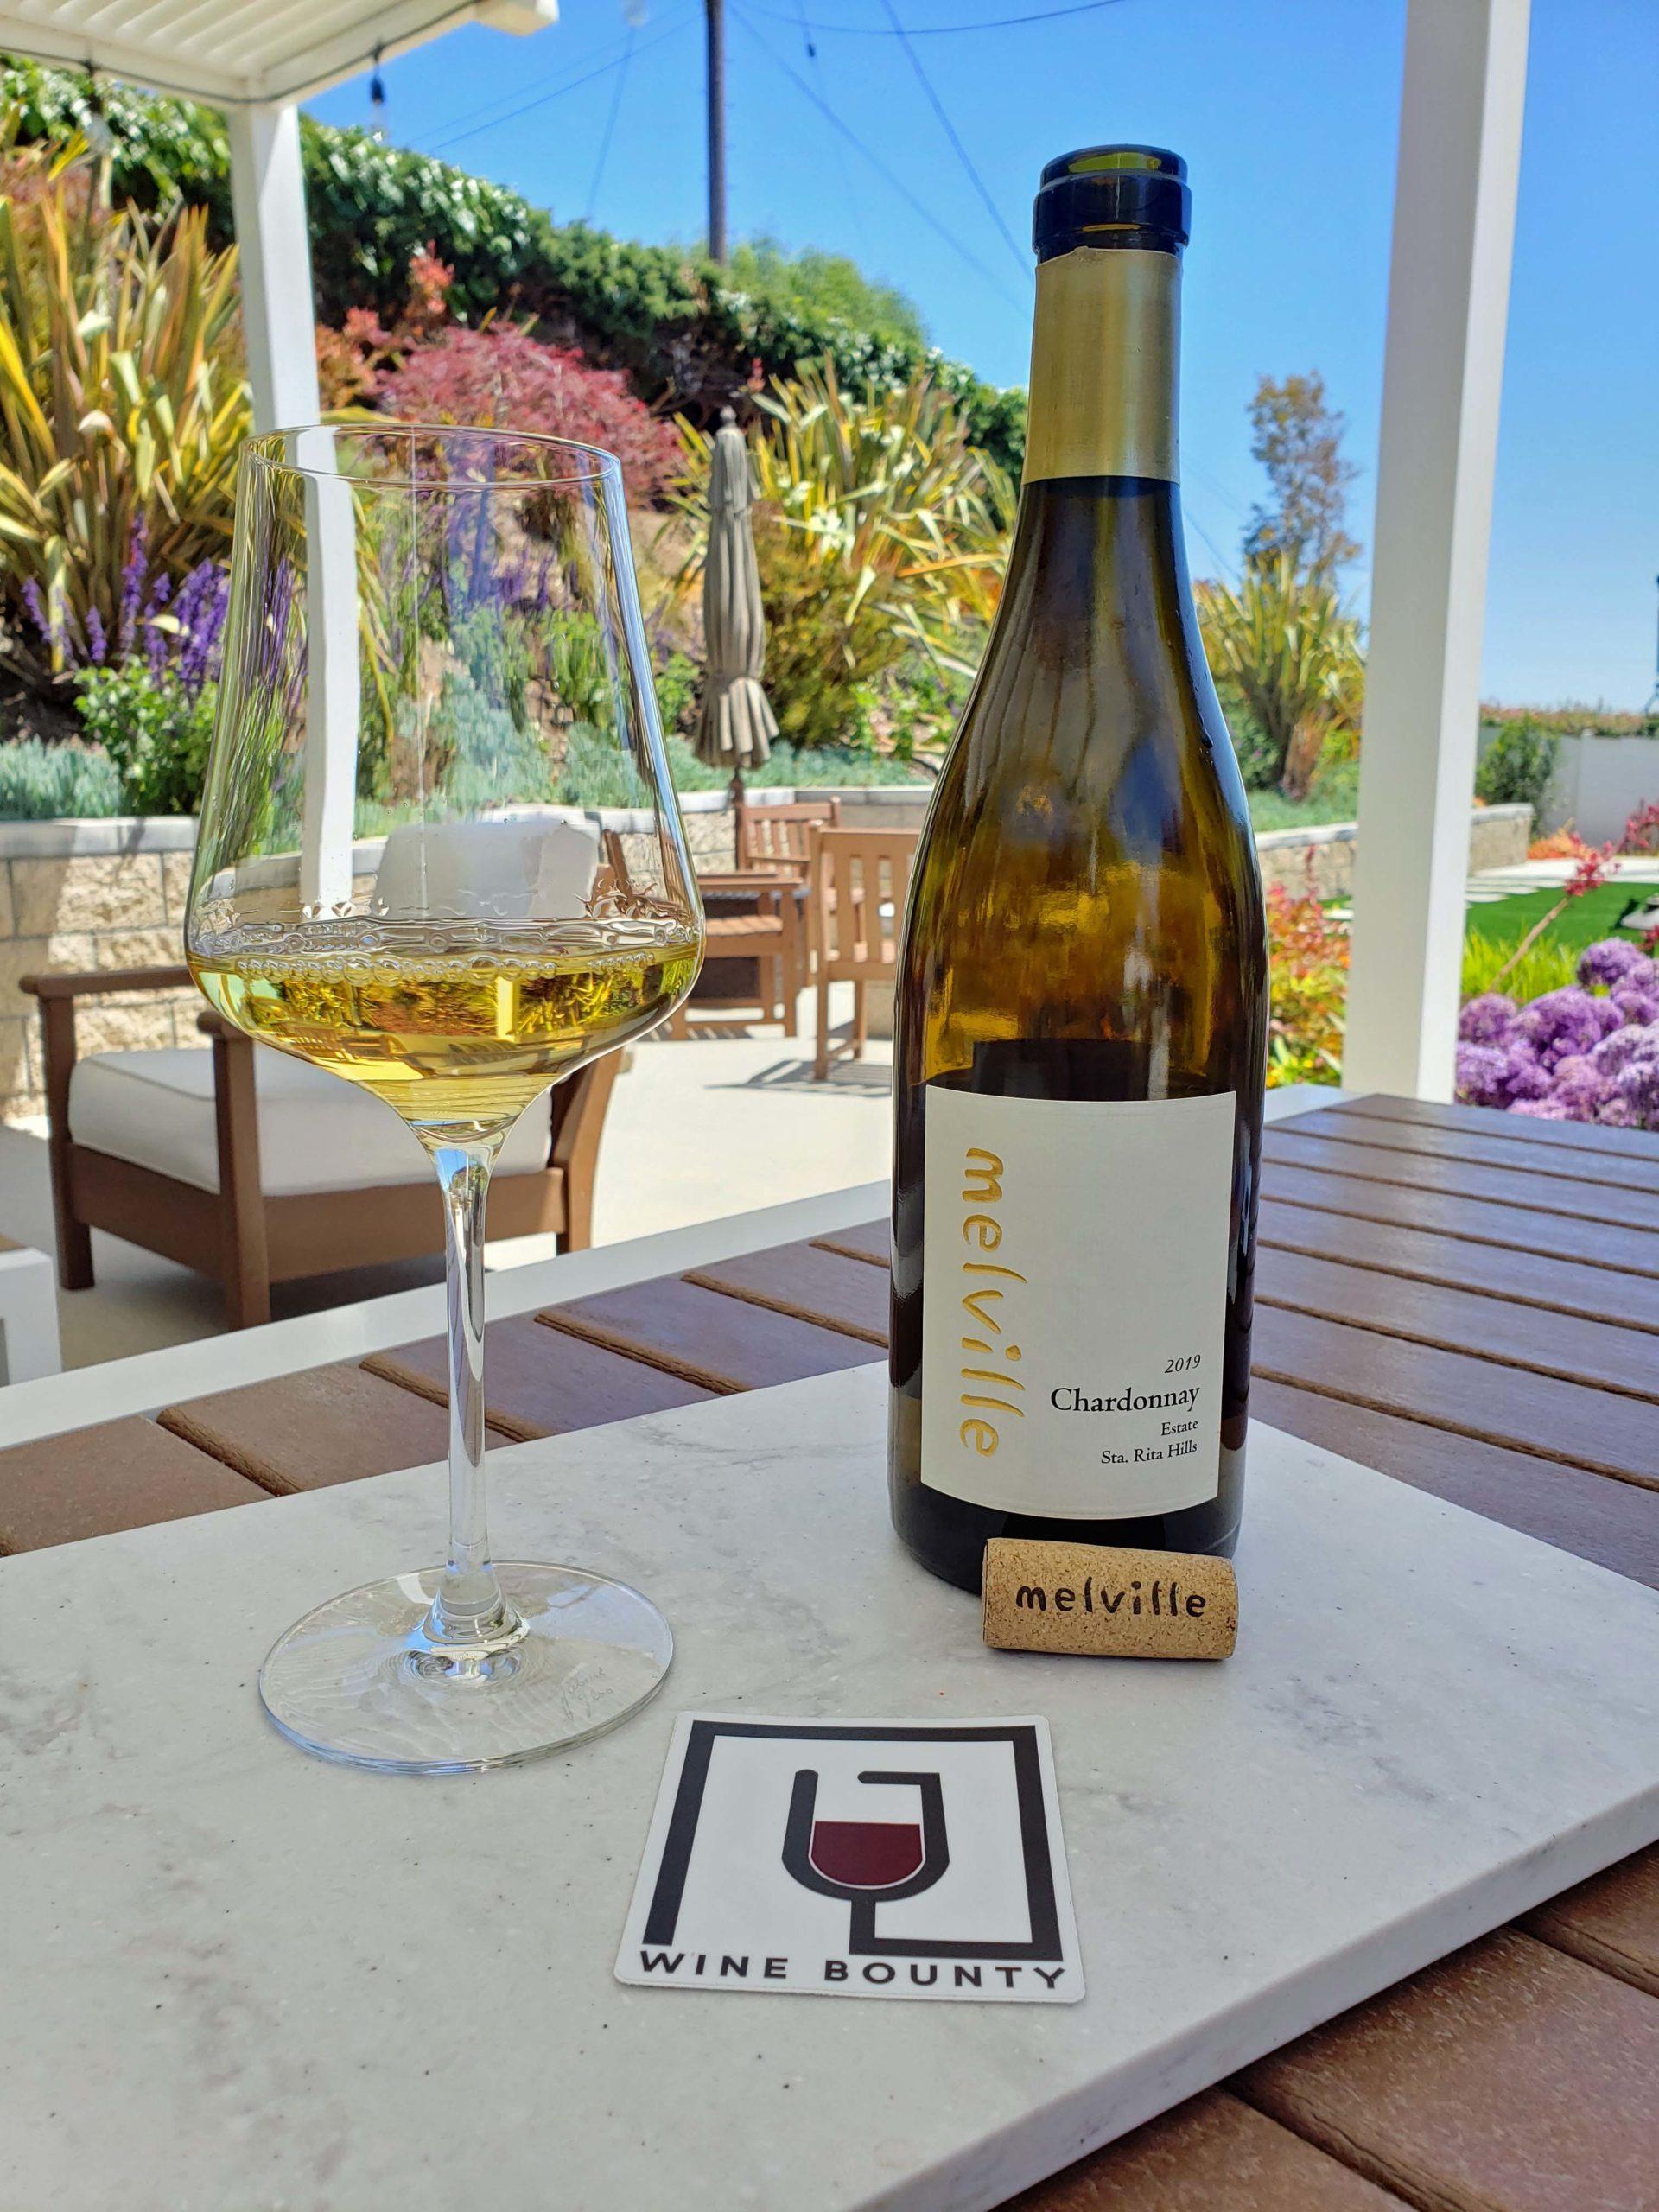 2019 Melville Estate Chardonnay